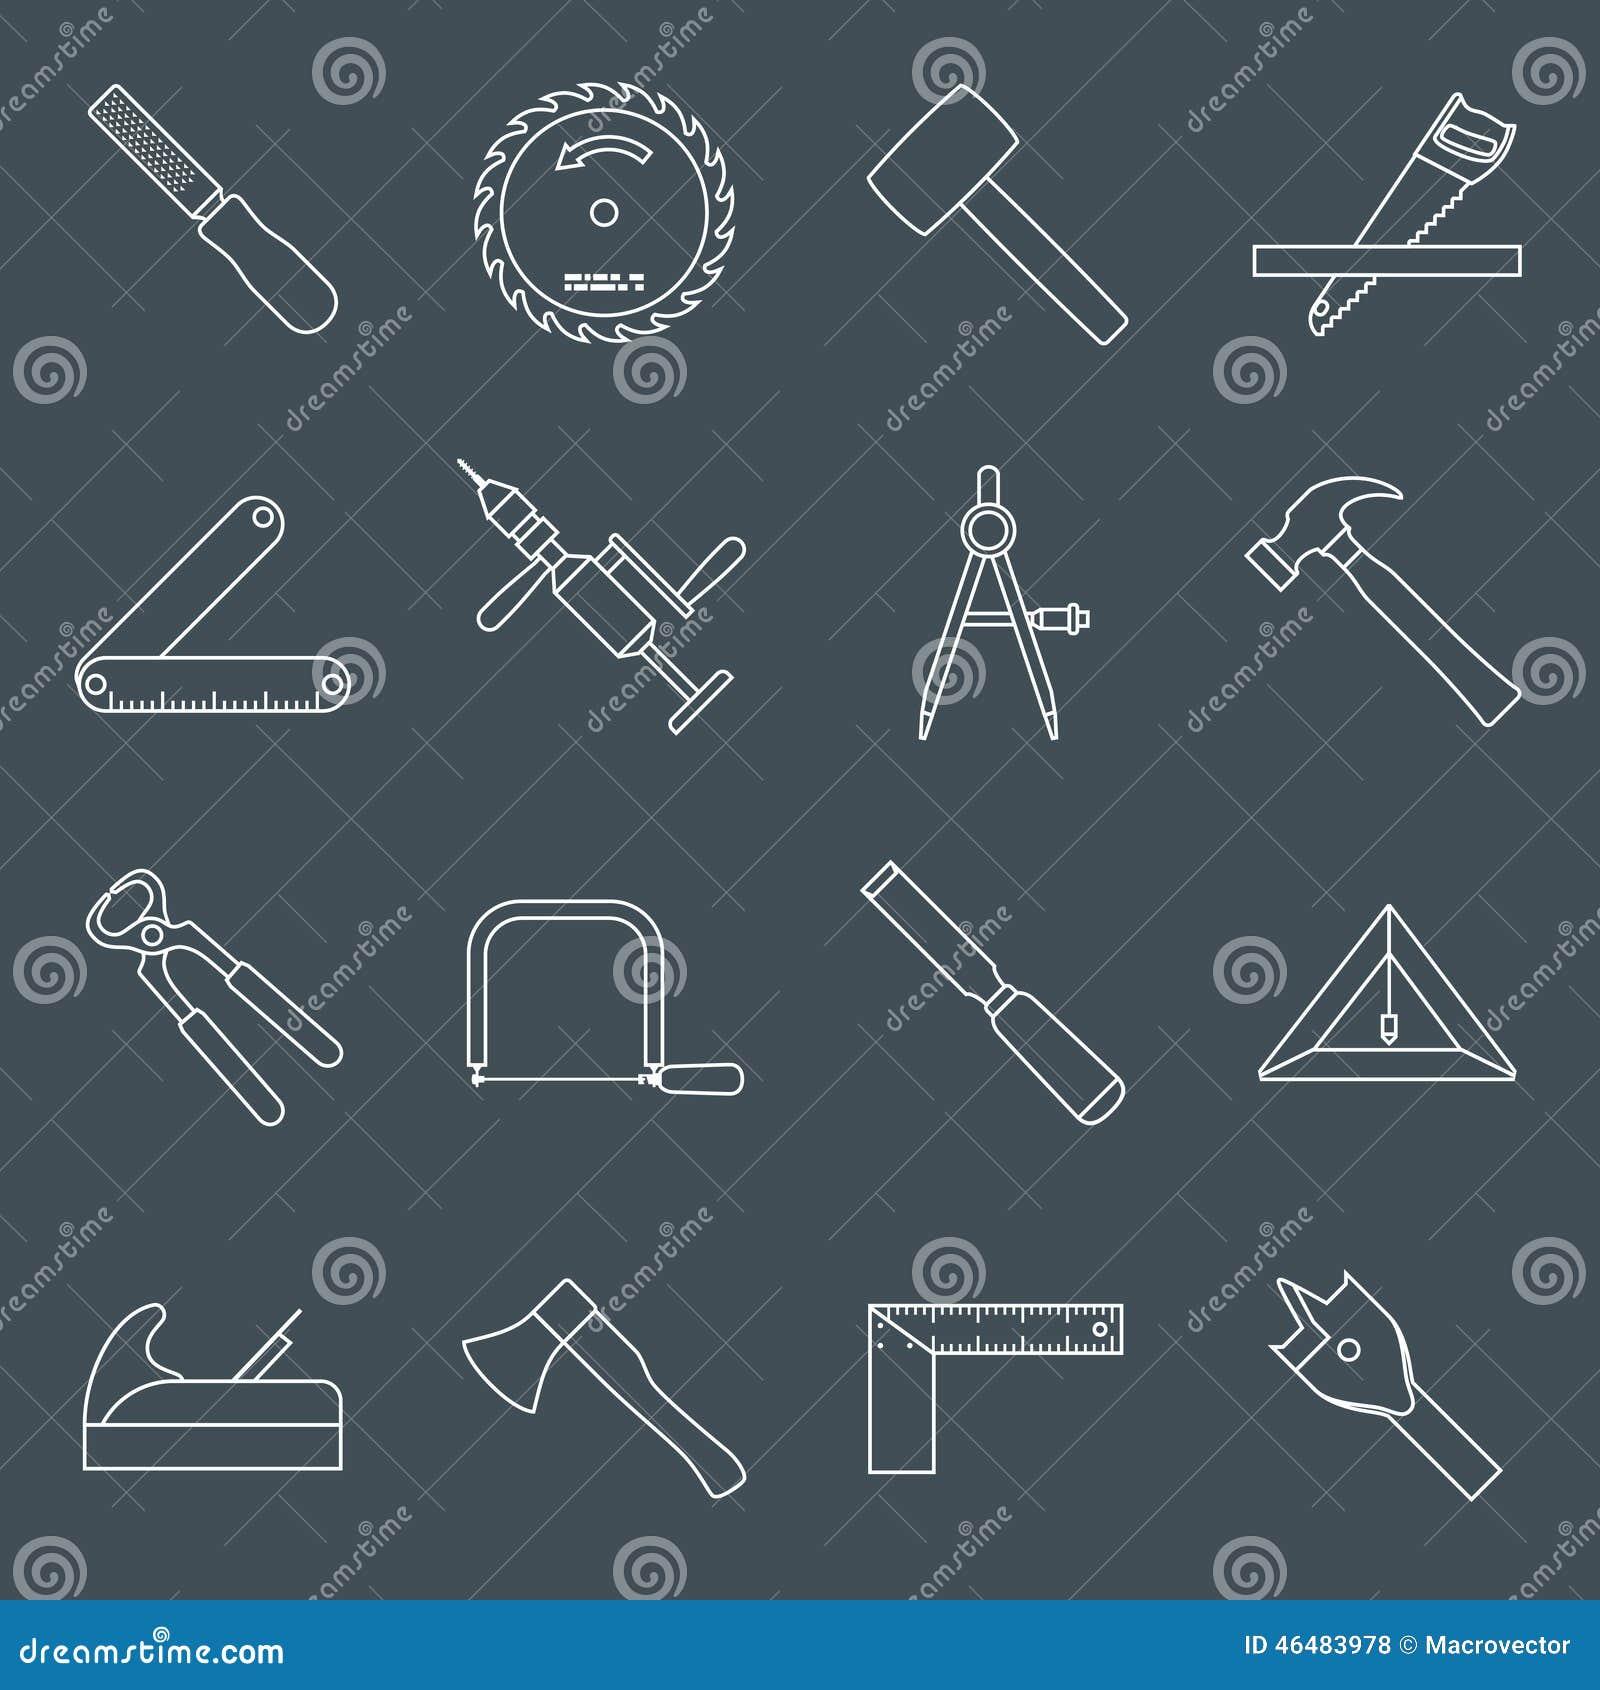 De pictogrammenoverzicht van timmerwerkhulpmiddelen